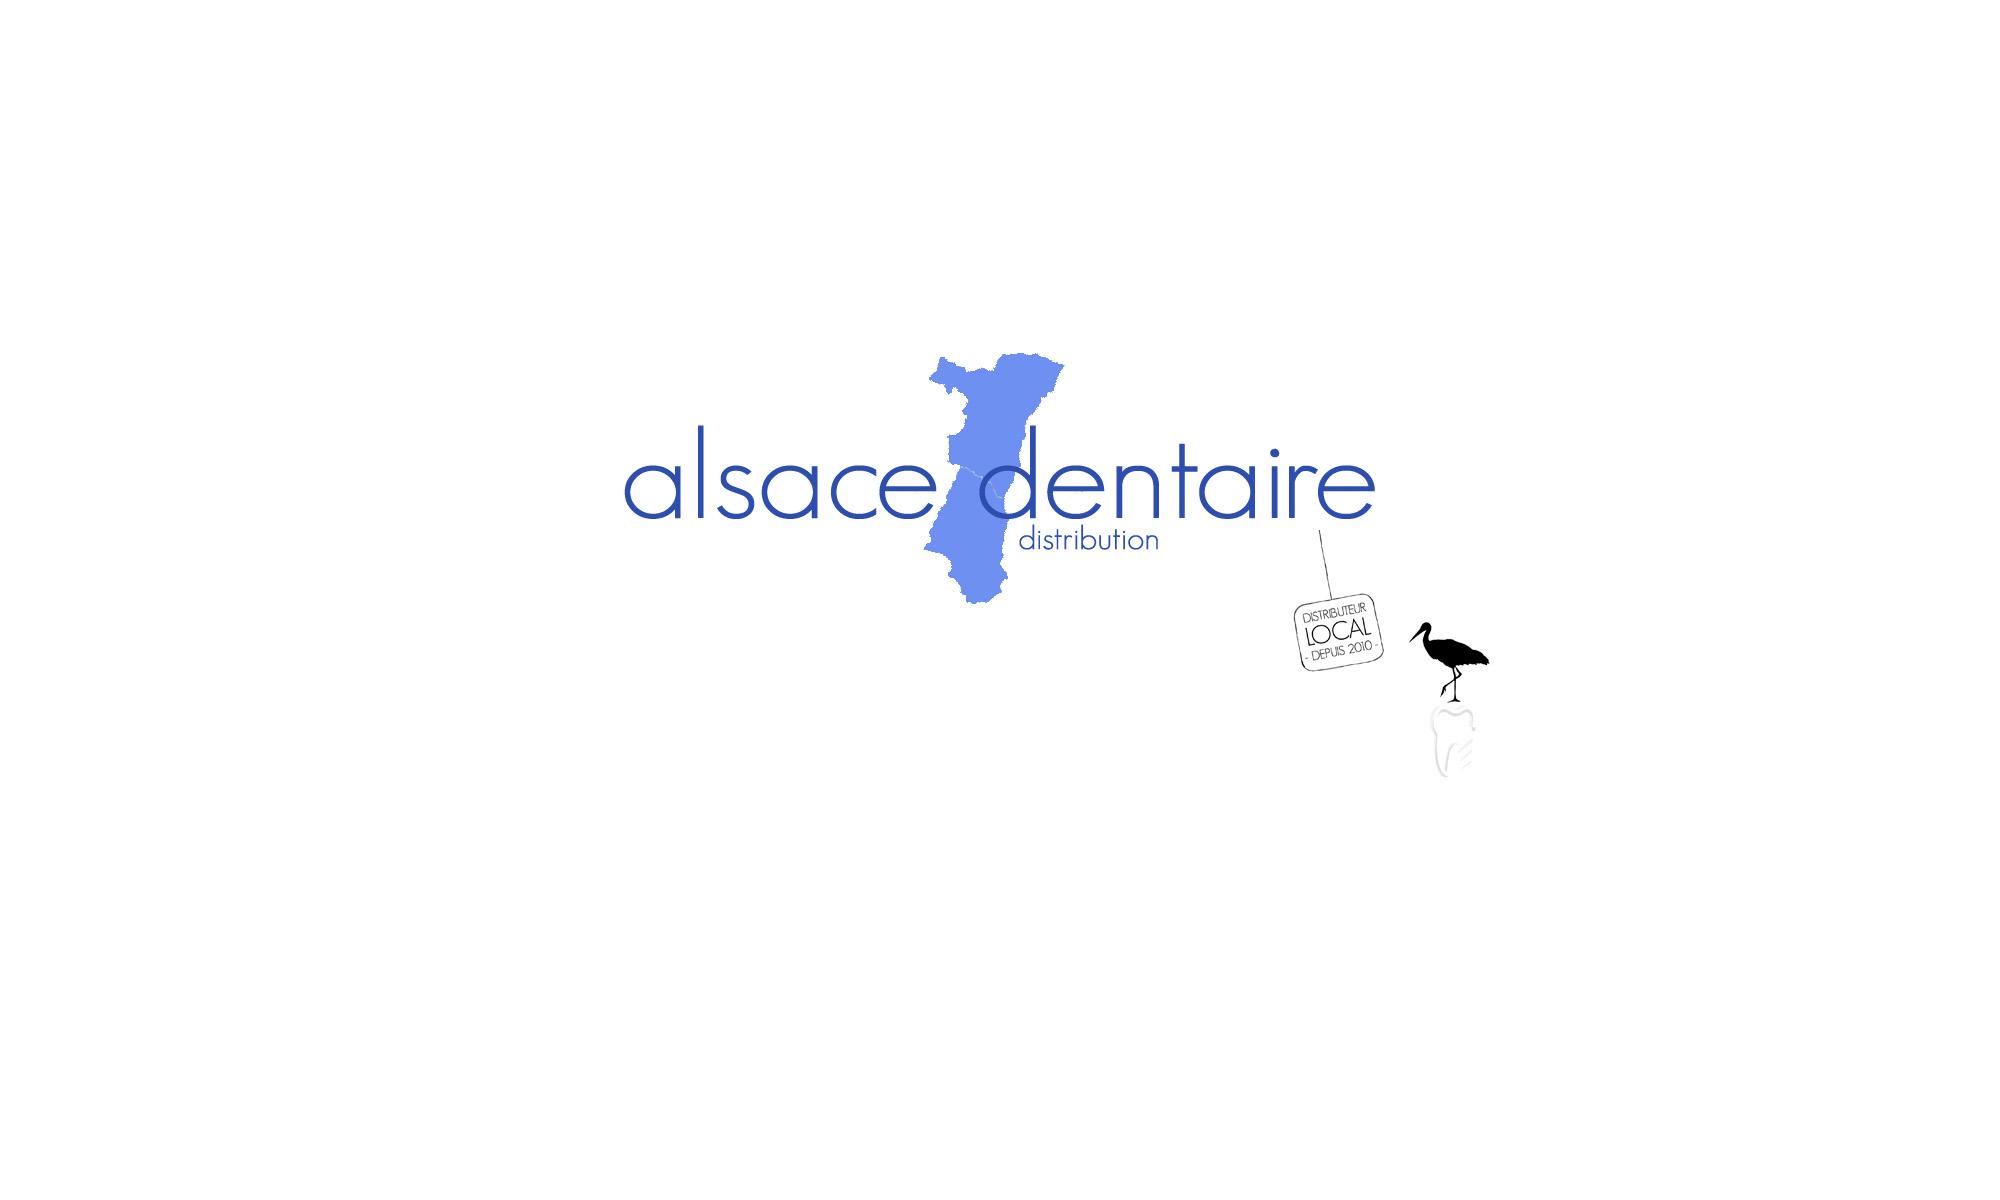 Alsace Dentaire Distribution